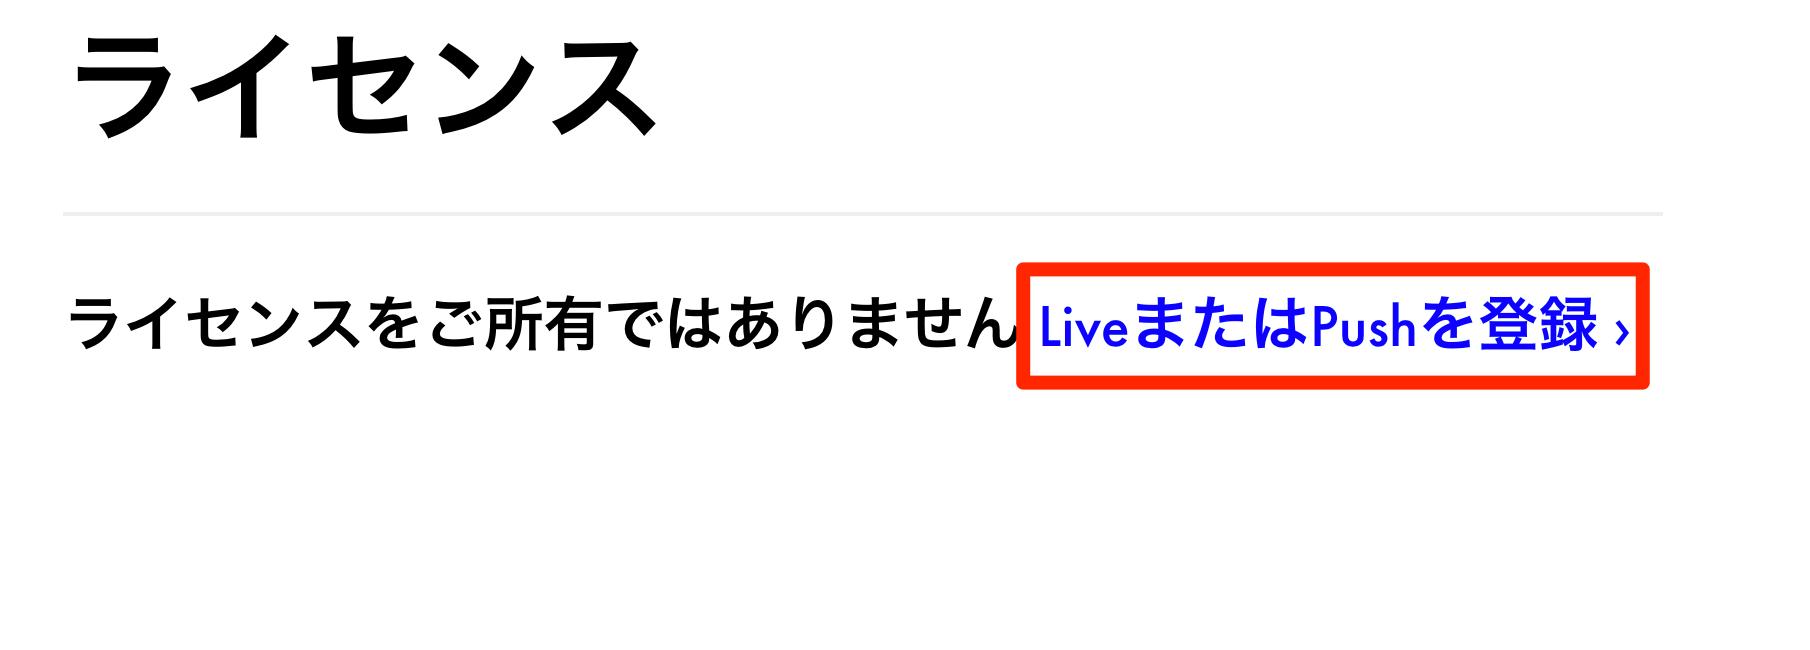 Ableton Live_ライセンス